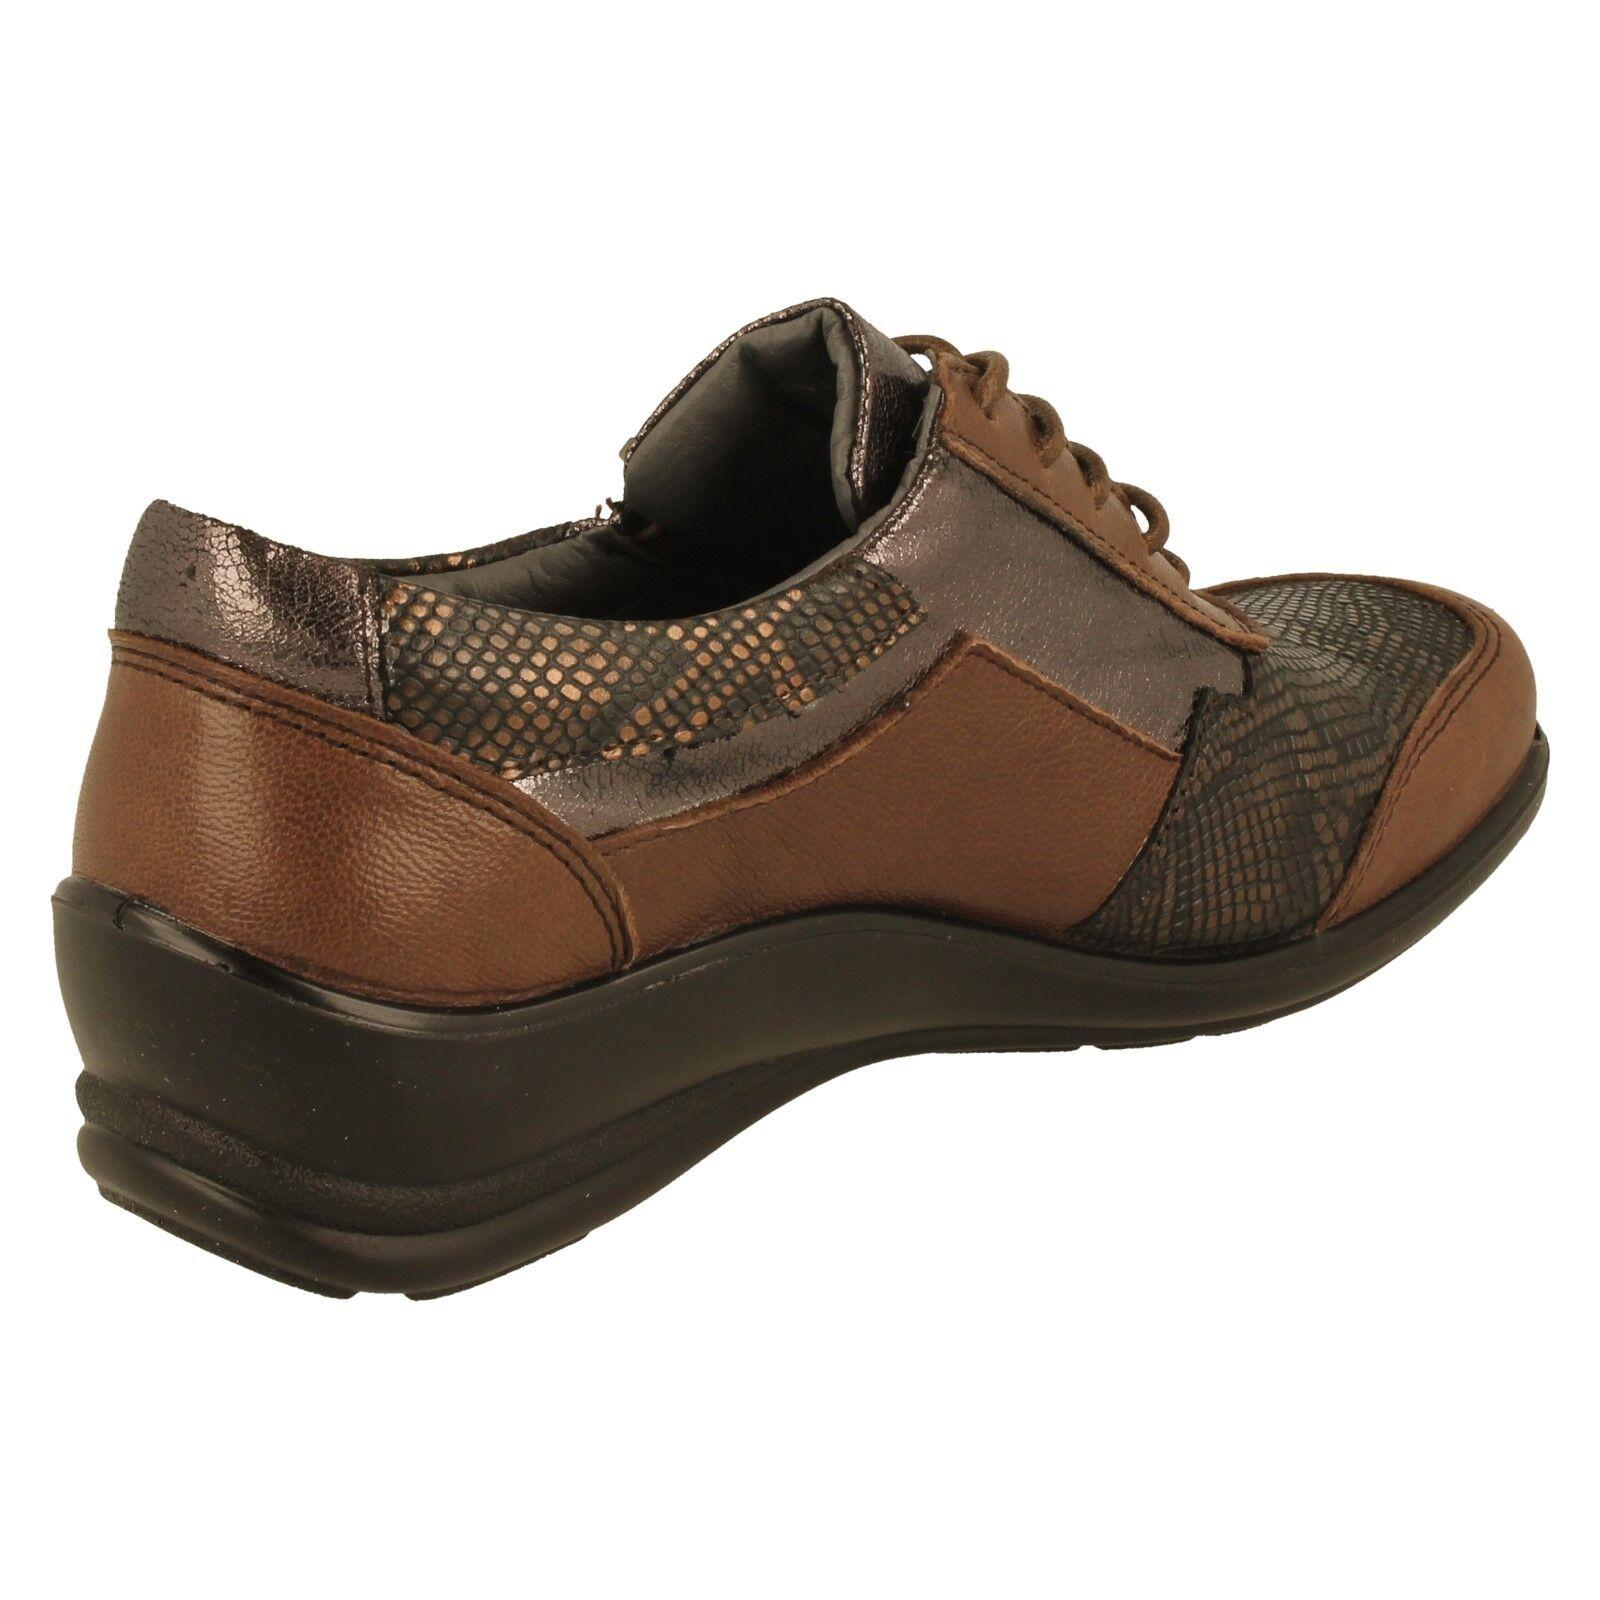 women Padders Dual Fit shoes shoes shoes Casual - Steffi a485fd